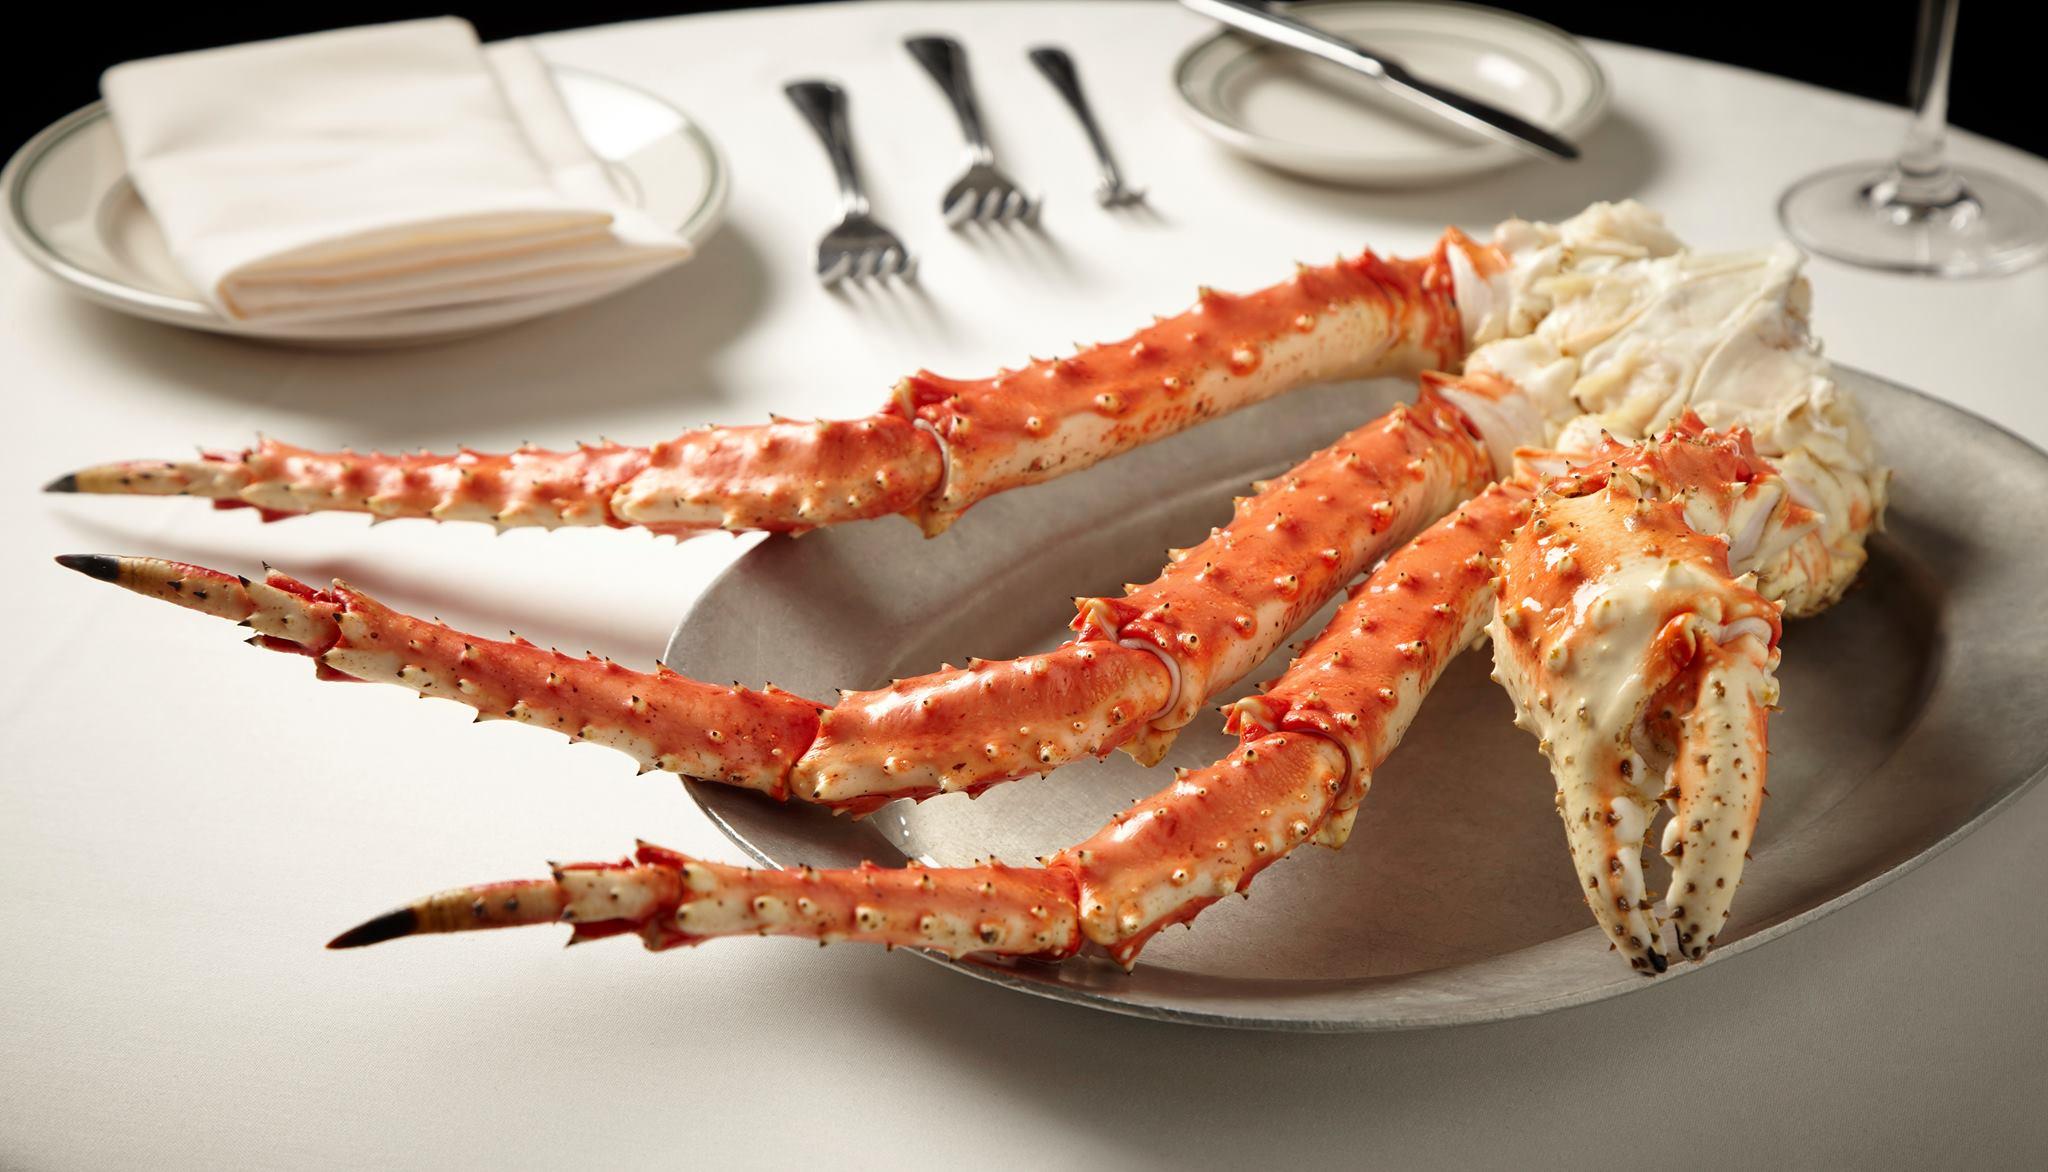 Fresh Alaskan King Crab Leg at Joe's Seafood Prime Steak & Stone Crab